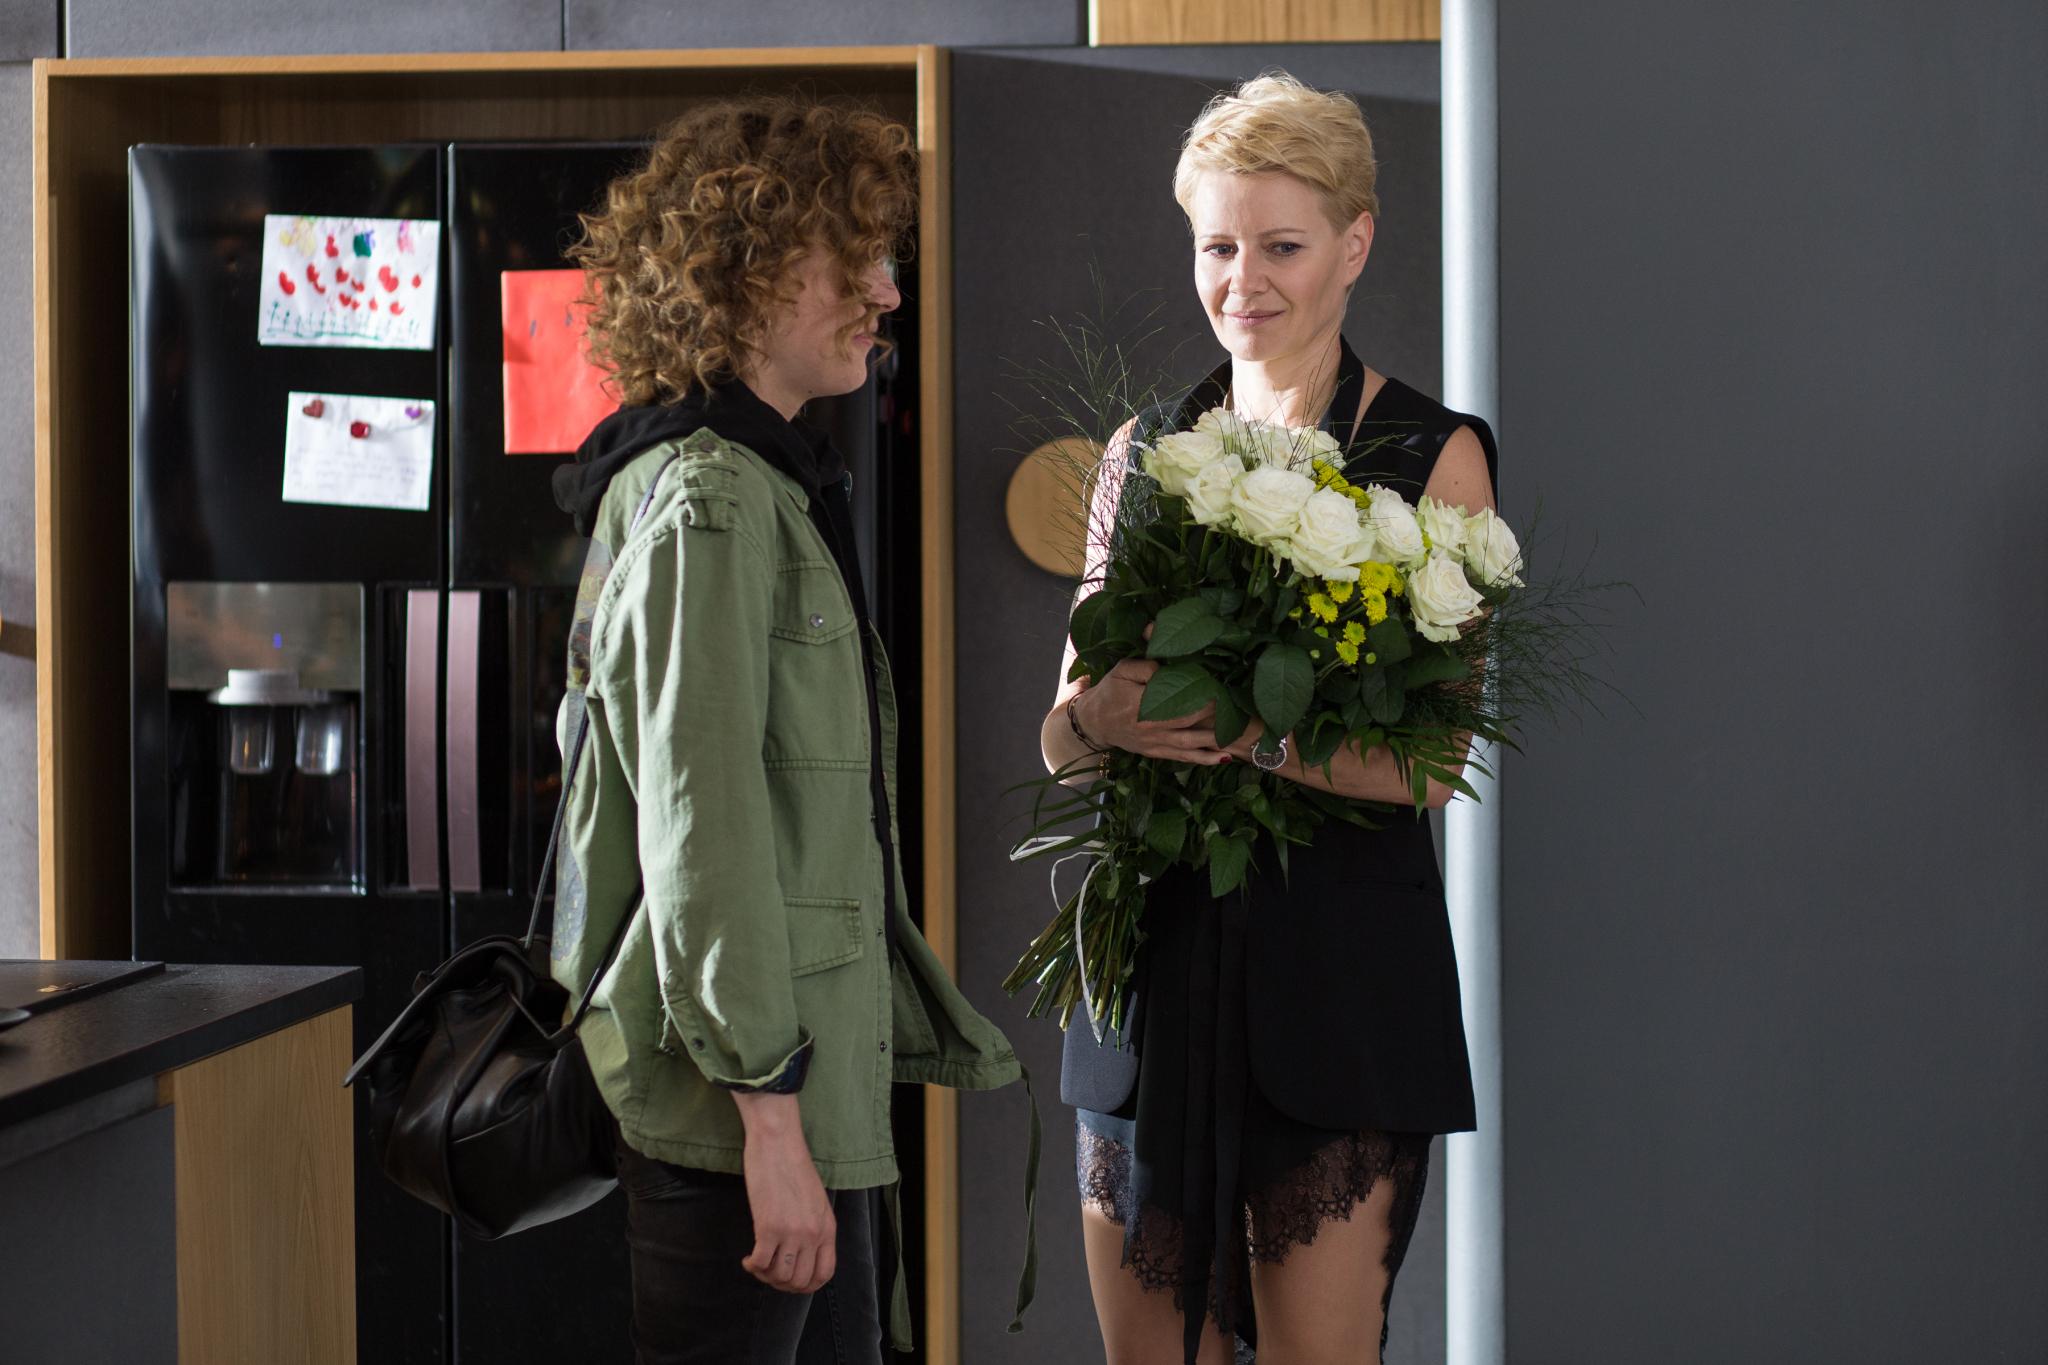 Druga szansa 4 - odcinek 1 - Justyna i Monika